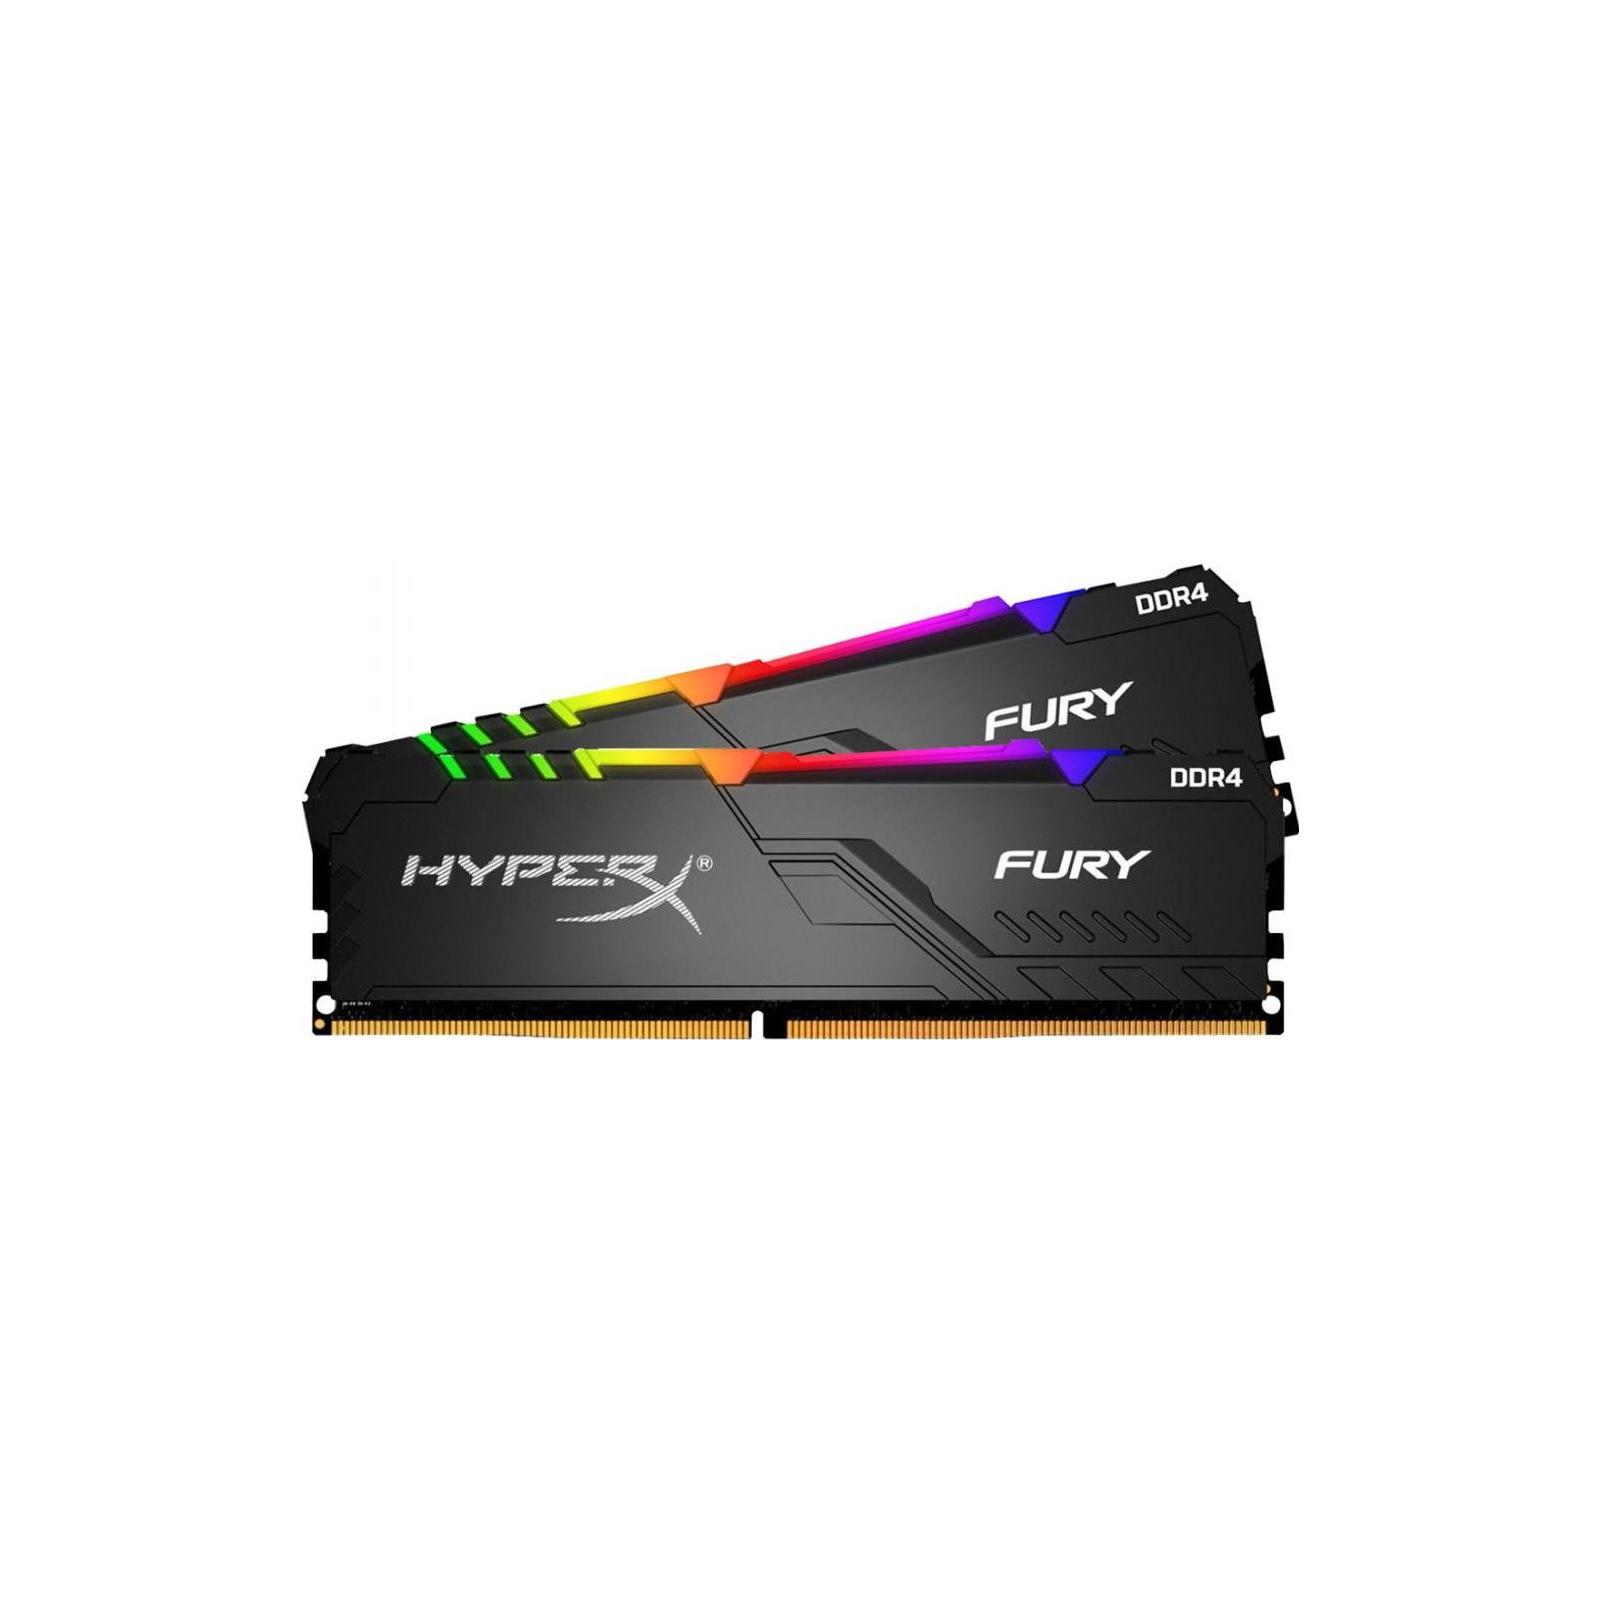 Модуль памяти для компьютера DDR4 16GB (2x8GB) 3200 MHz HyperX FURY RGB Kingston (HX432C16FB3AK2/16) изображение 2